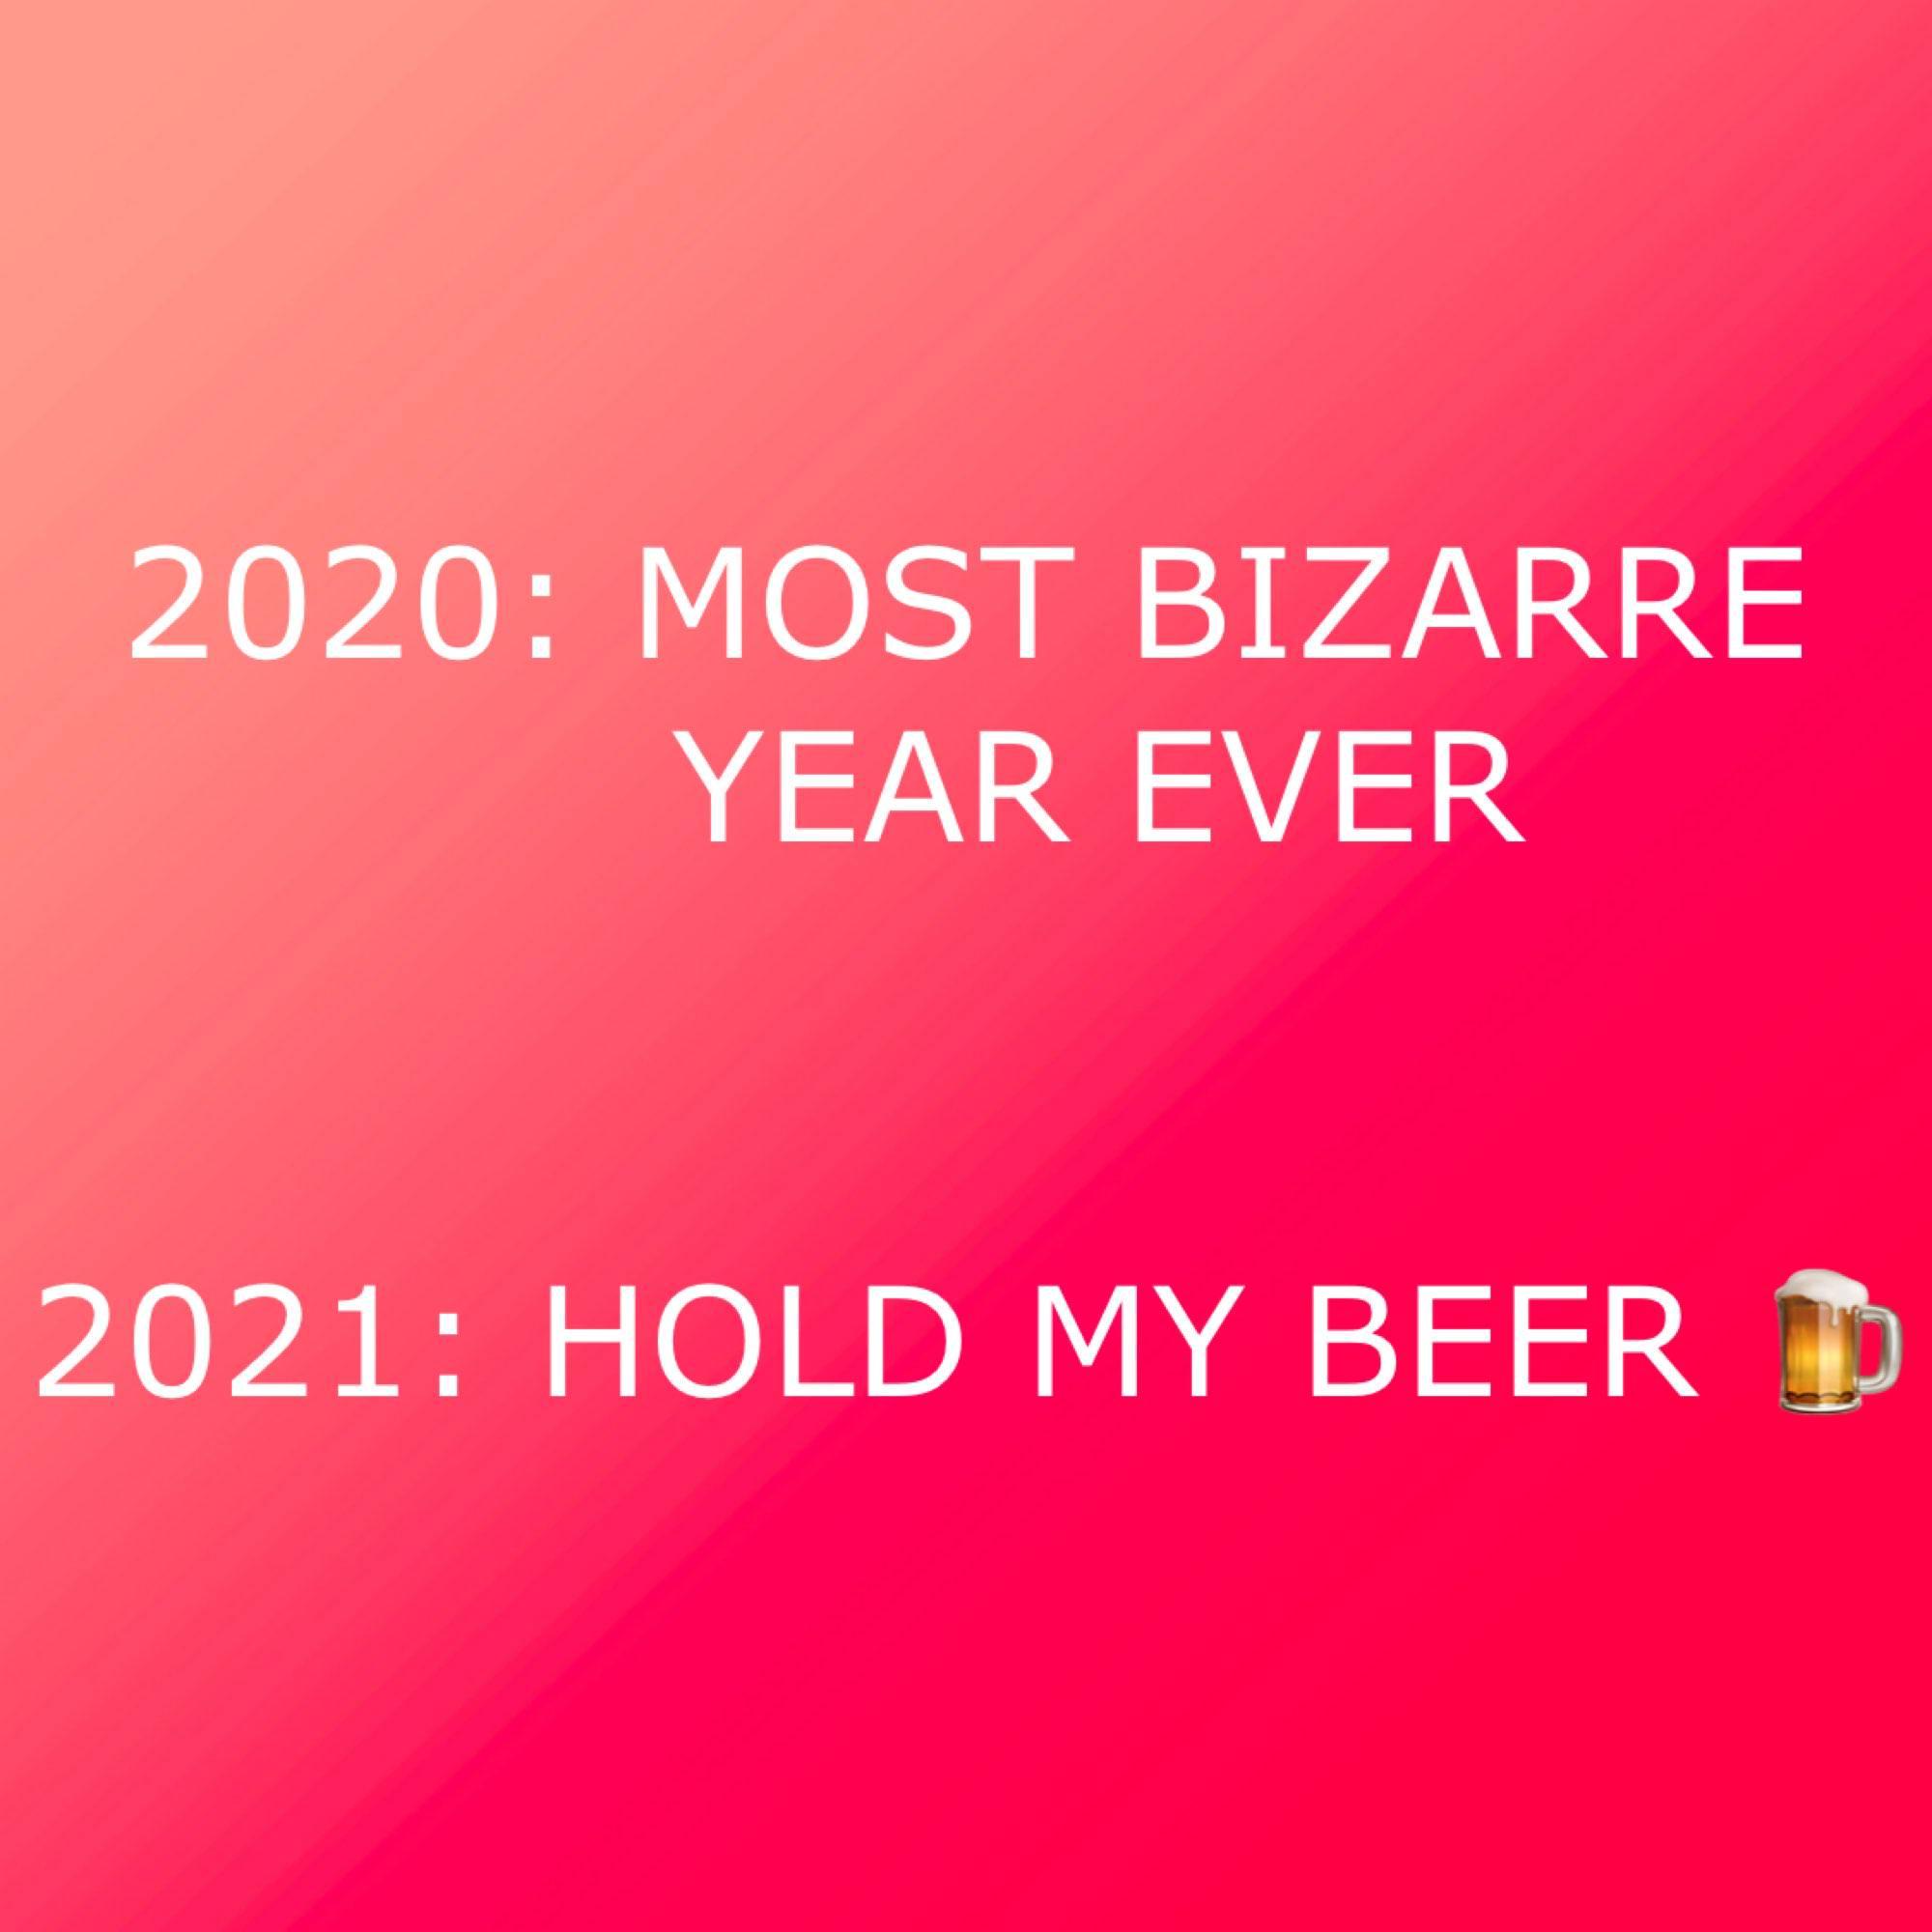 202101070710-TFfjoq8iuQ.jpeg